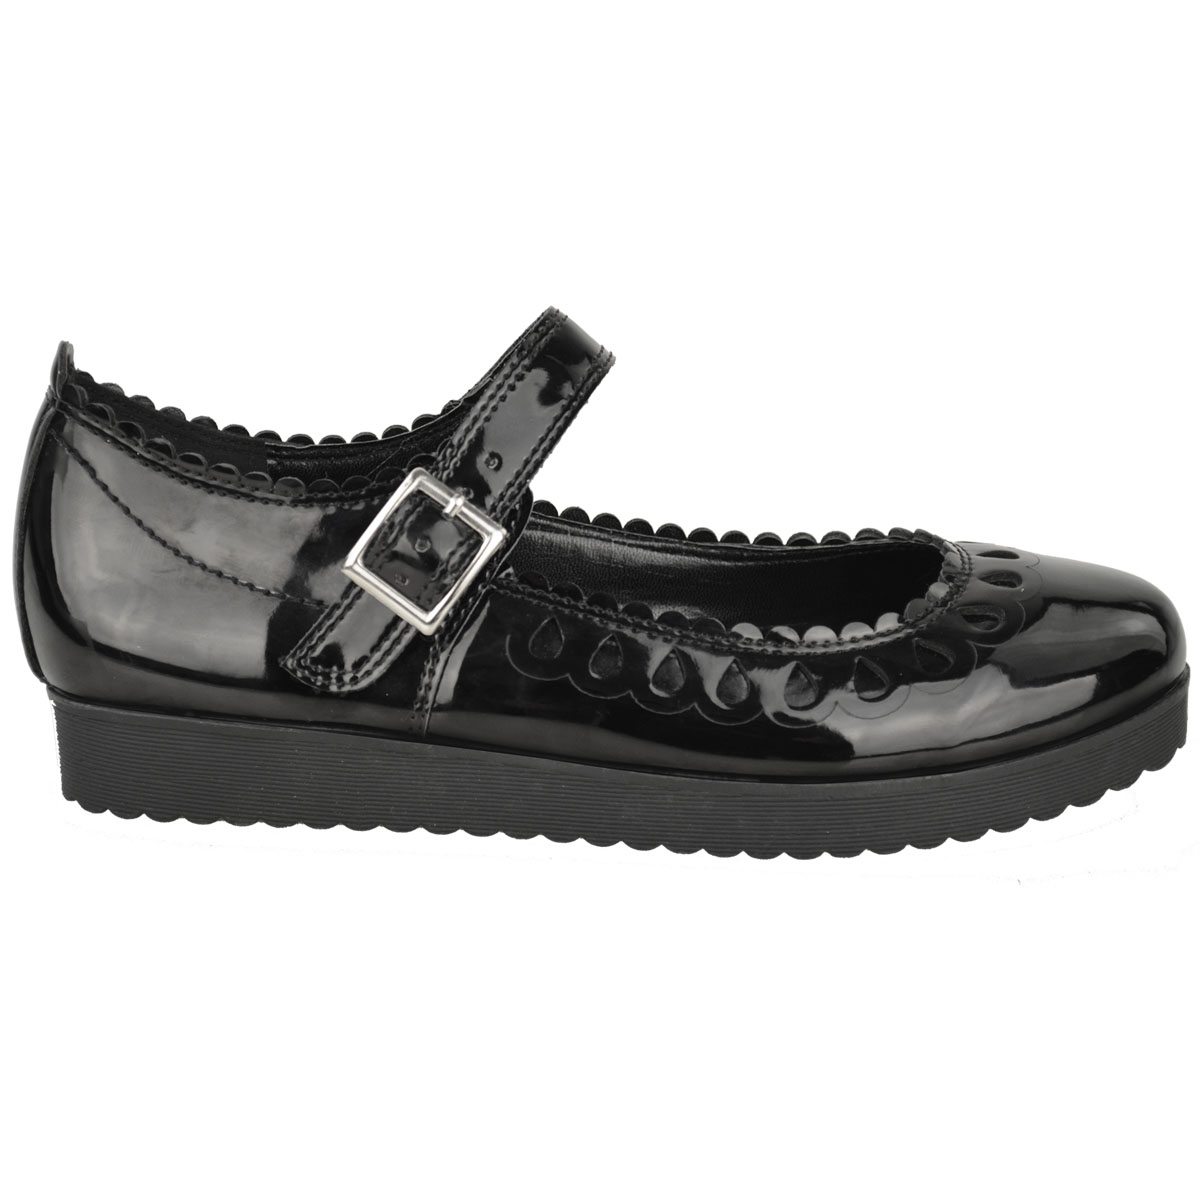 New-Womens-Ladies-Girls-Flats-Shoes-Pumps-School-Work-Office-Geek-Low-Heels-Size thumbnail 3